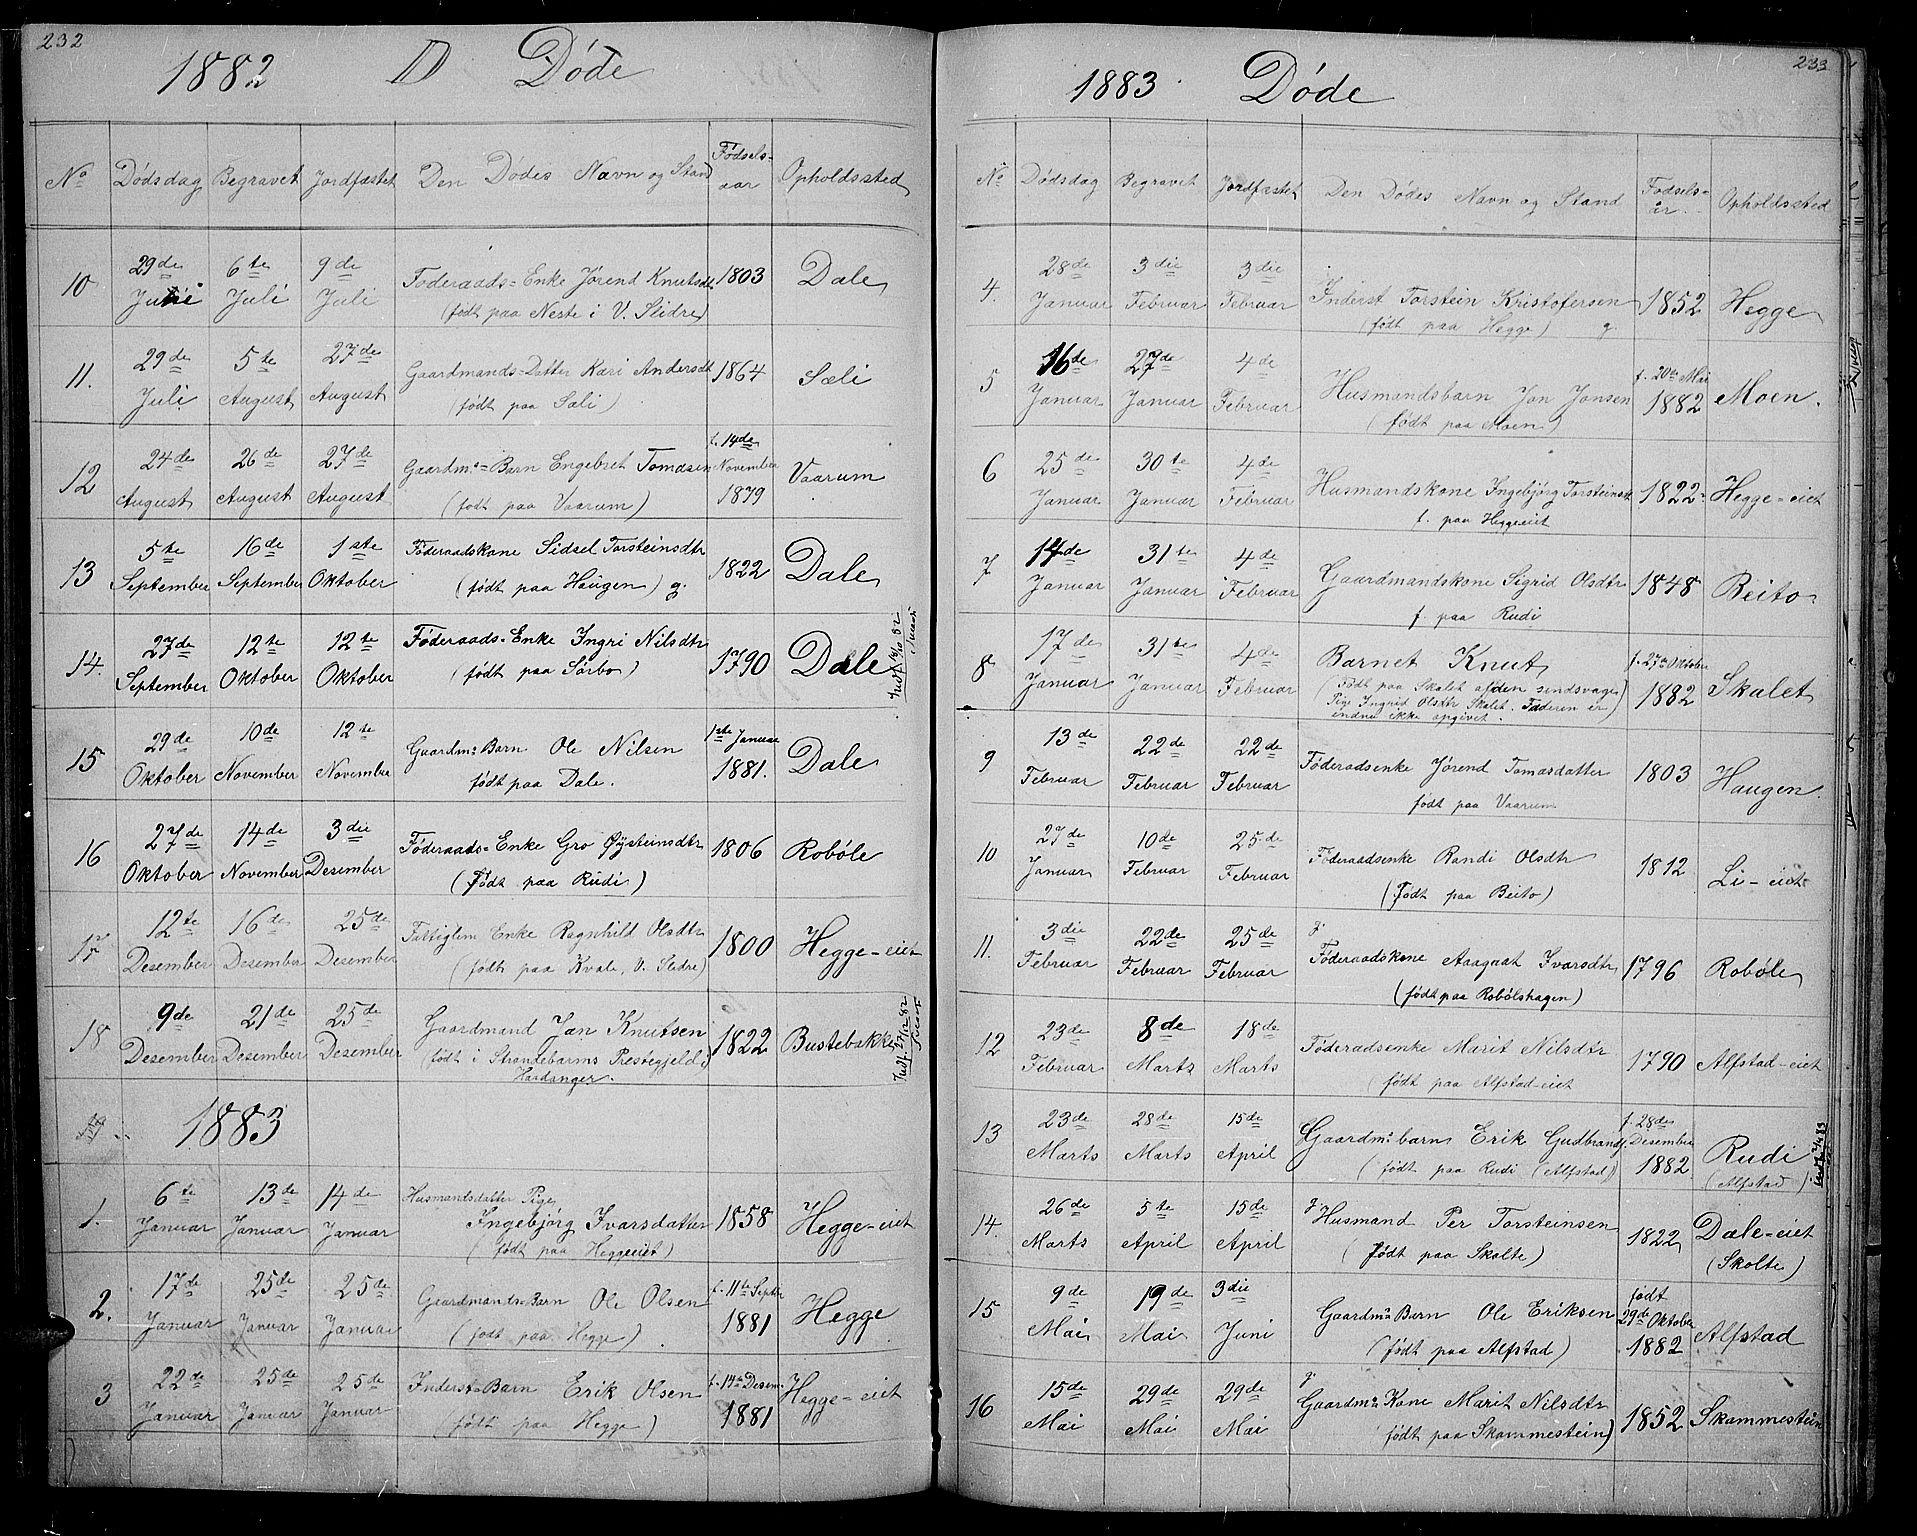 SAH, Øystre Slidre prestekontor, Klokkerbok nr. 1, 1866-1886, s. 232-233